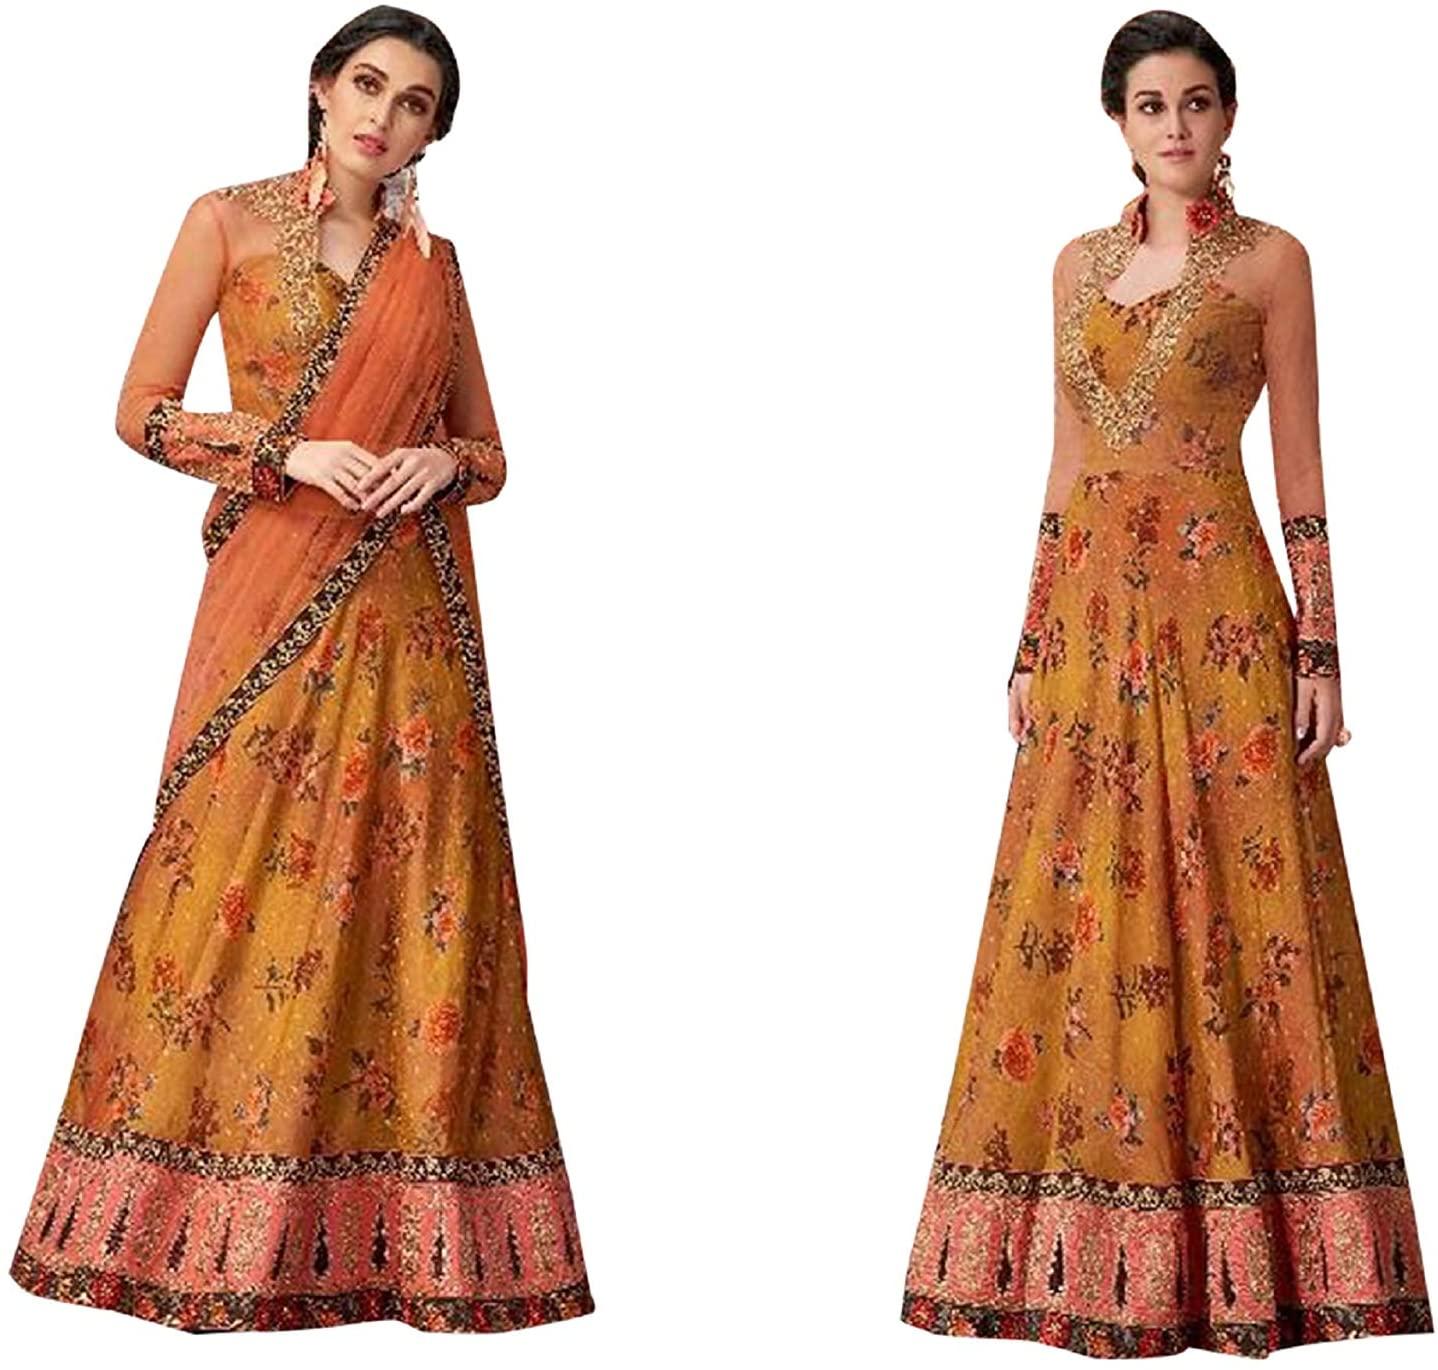 Mustard Designer Printed Lehenga Ghagra Choli Festival Anarkali Gown Dress Muslim Indian Women 8214